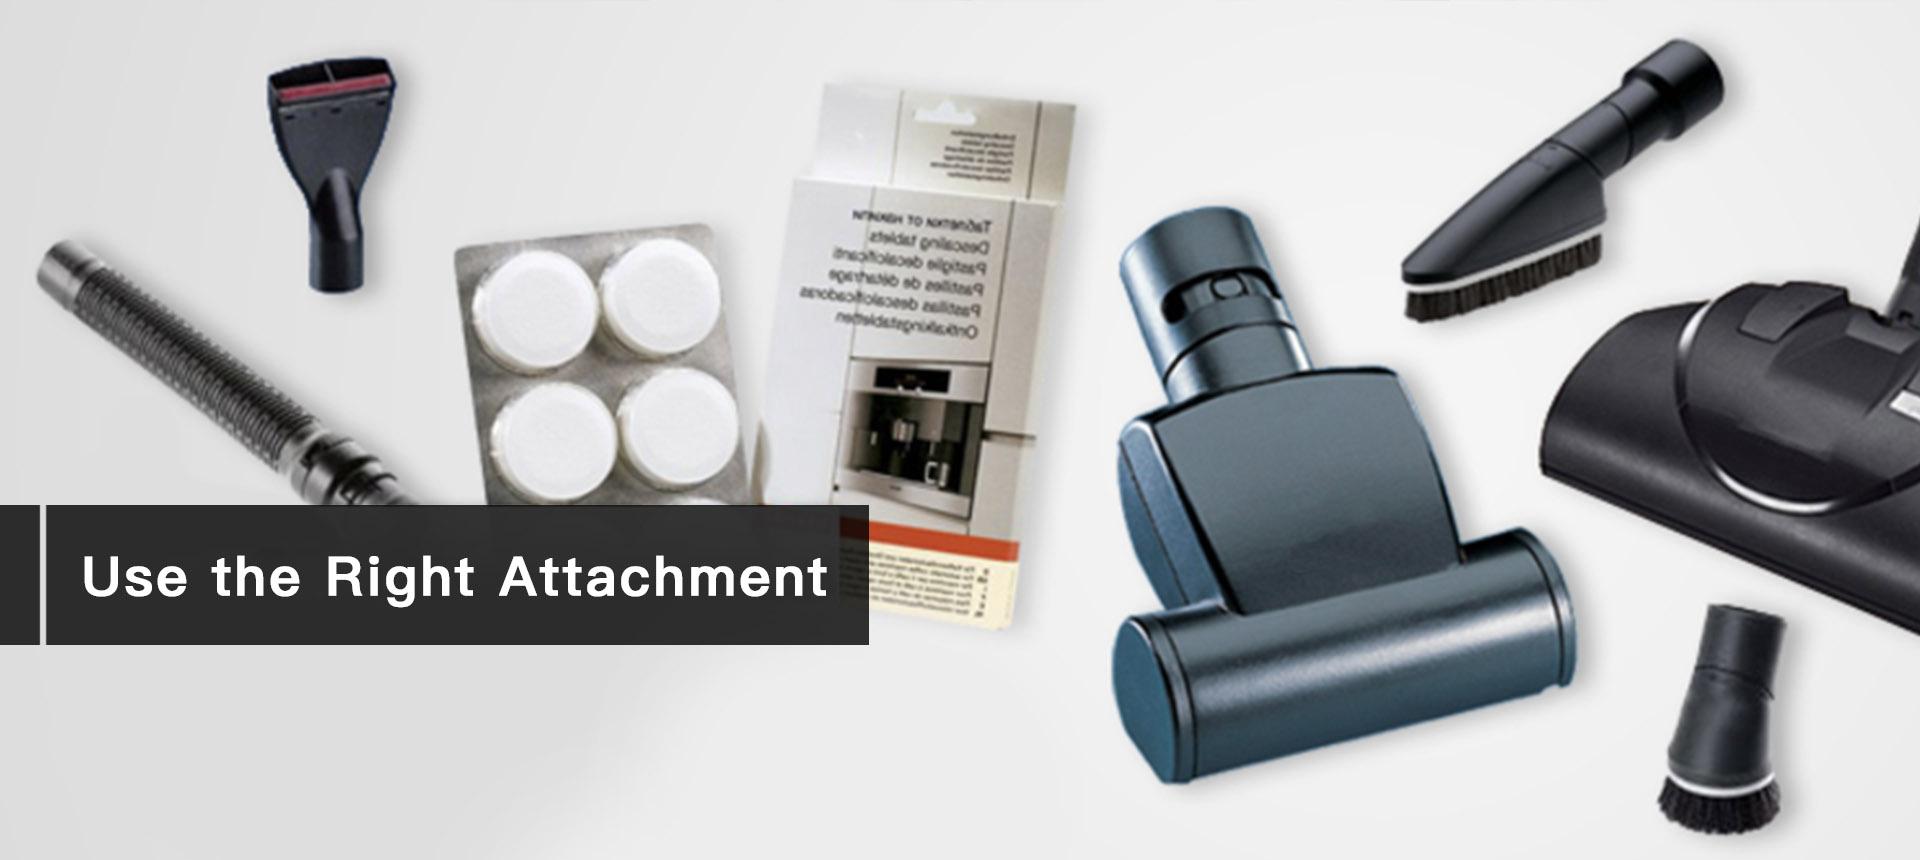 Usethe Right Attachment-2